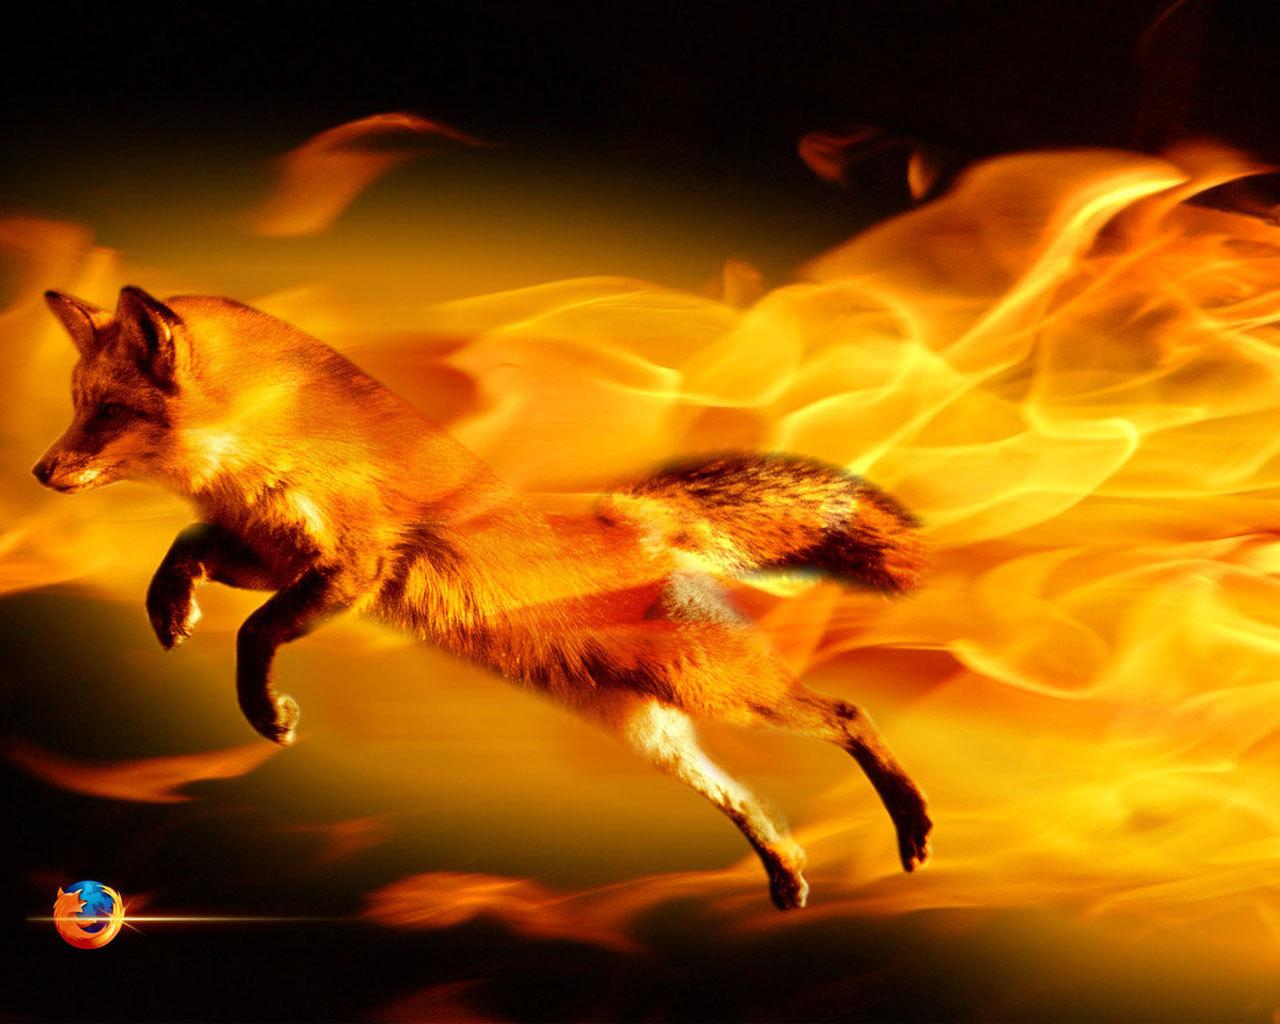 fox wallpaper fox wallpaper 24577442 fanpop